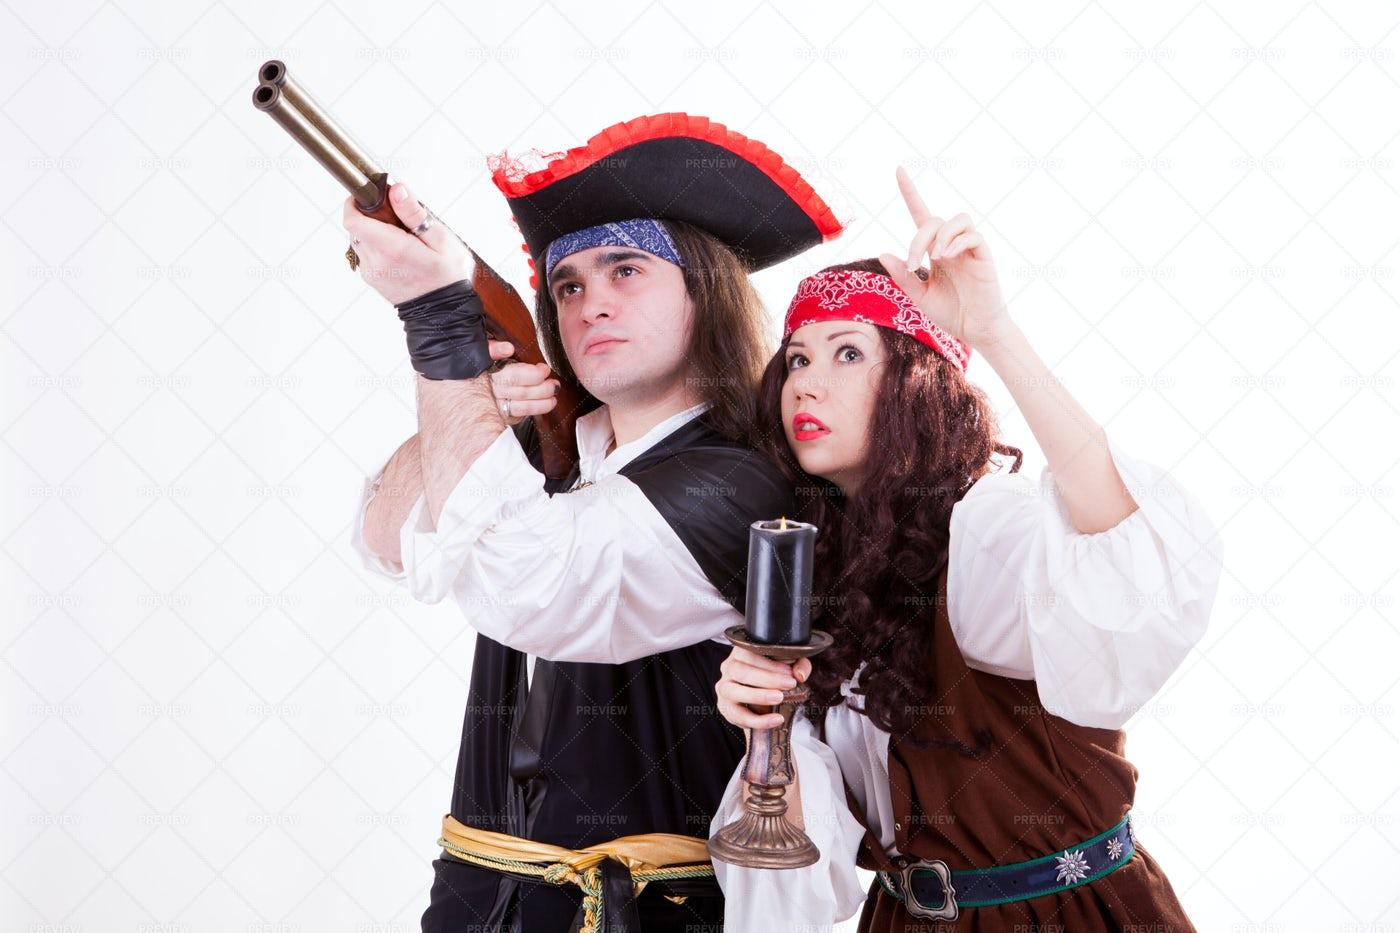 Two Pirates Prepared To Attack: Stock Photos